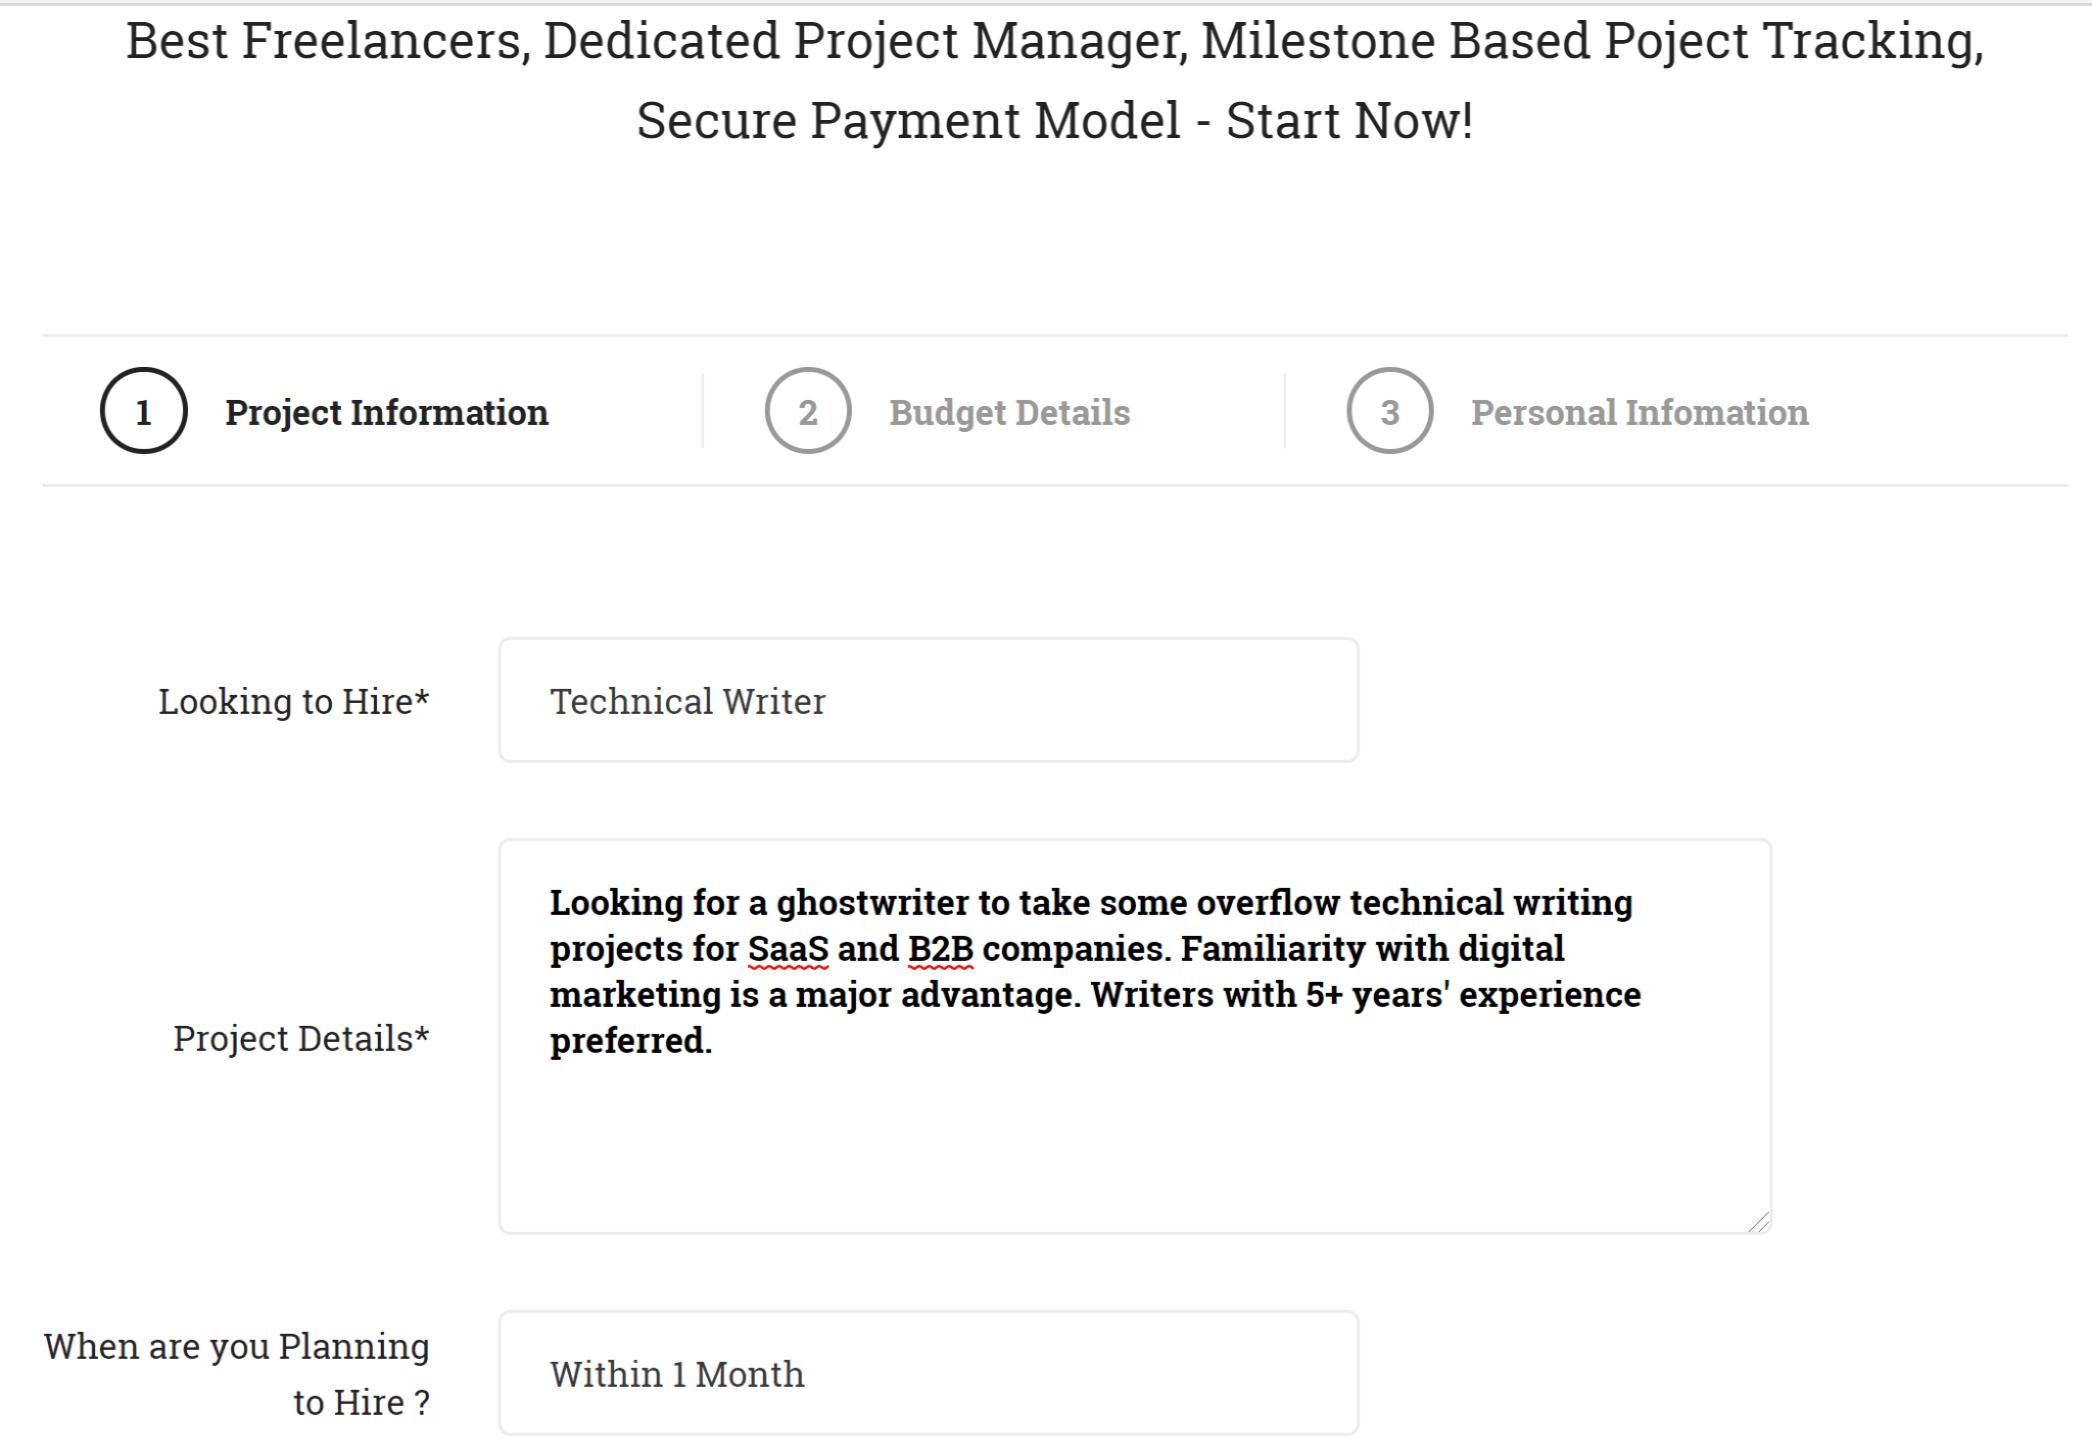 Skilldosti screenshot - project information